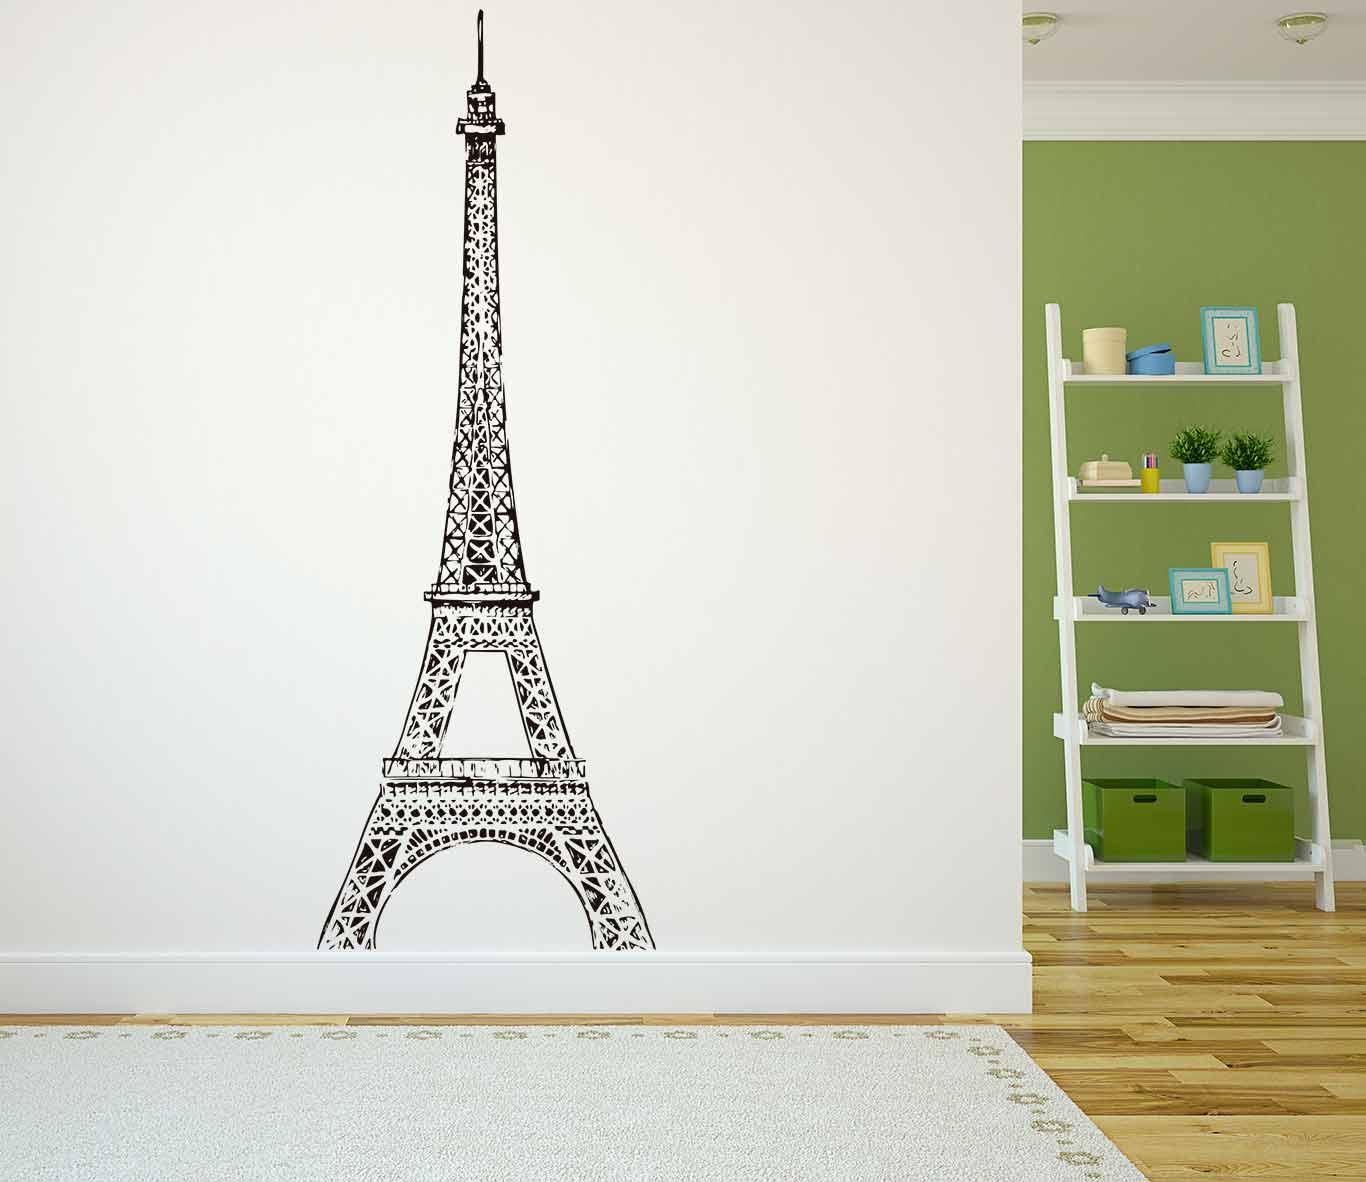 Vinilo decorativo Torre Eiffel | Carteles XXL - Impresión carteleria publicitaria